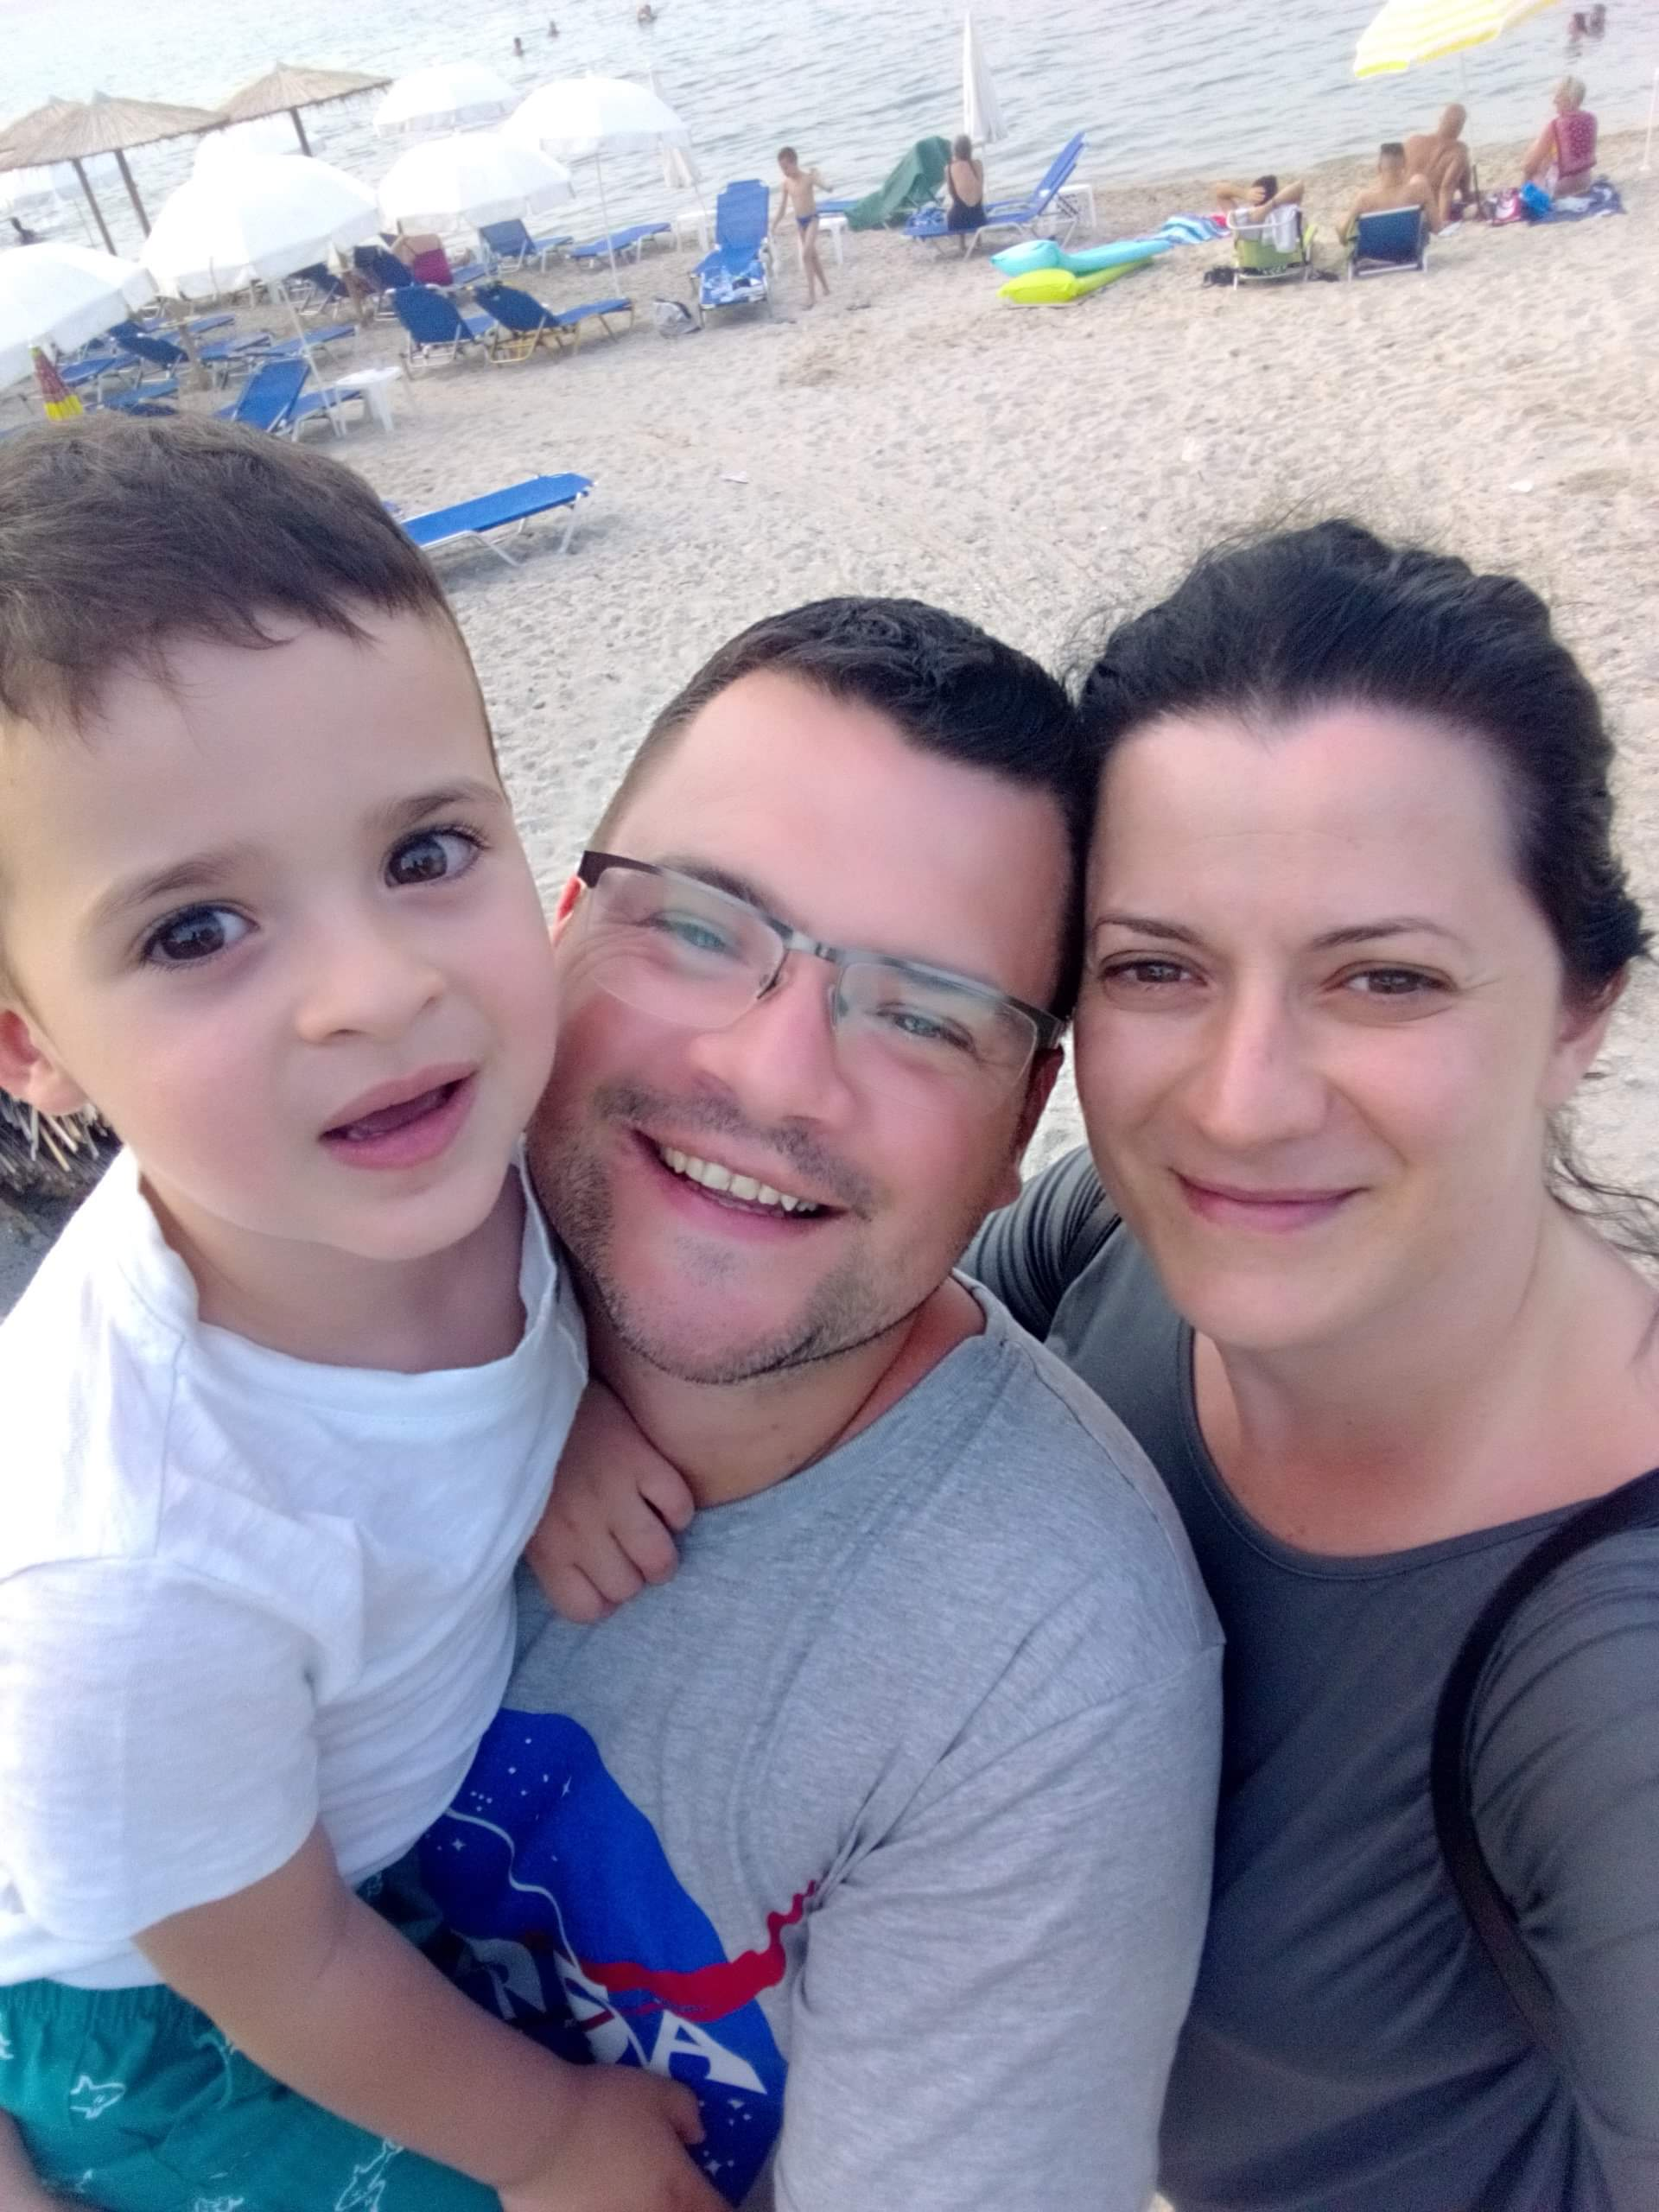 FAMILIA MENGHER DIN ALIBUNAR